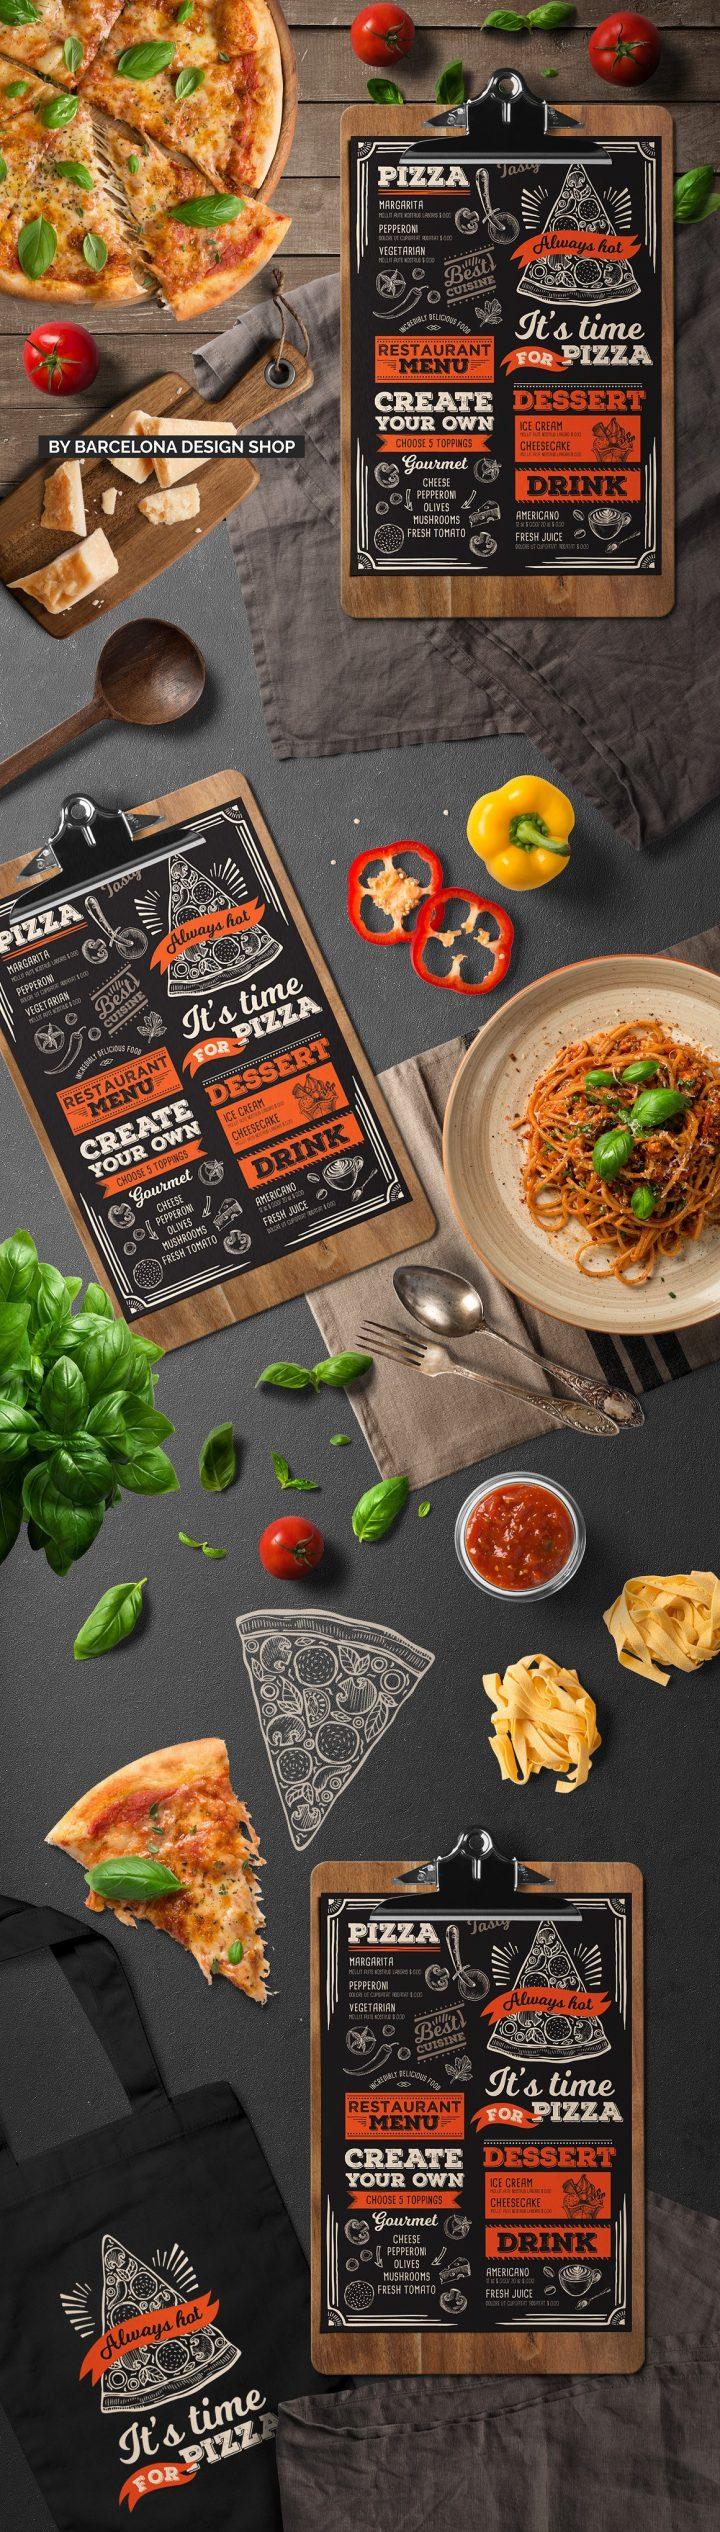 Italian menu designs templates psd ai free